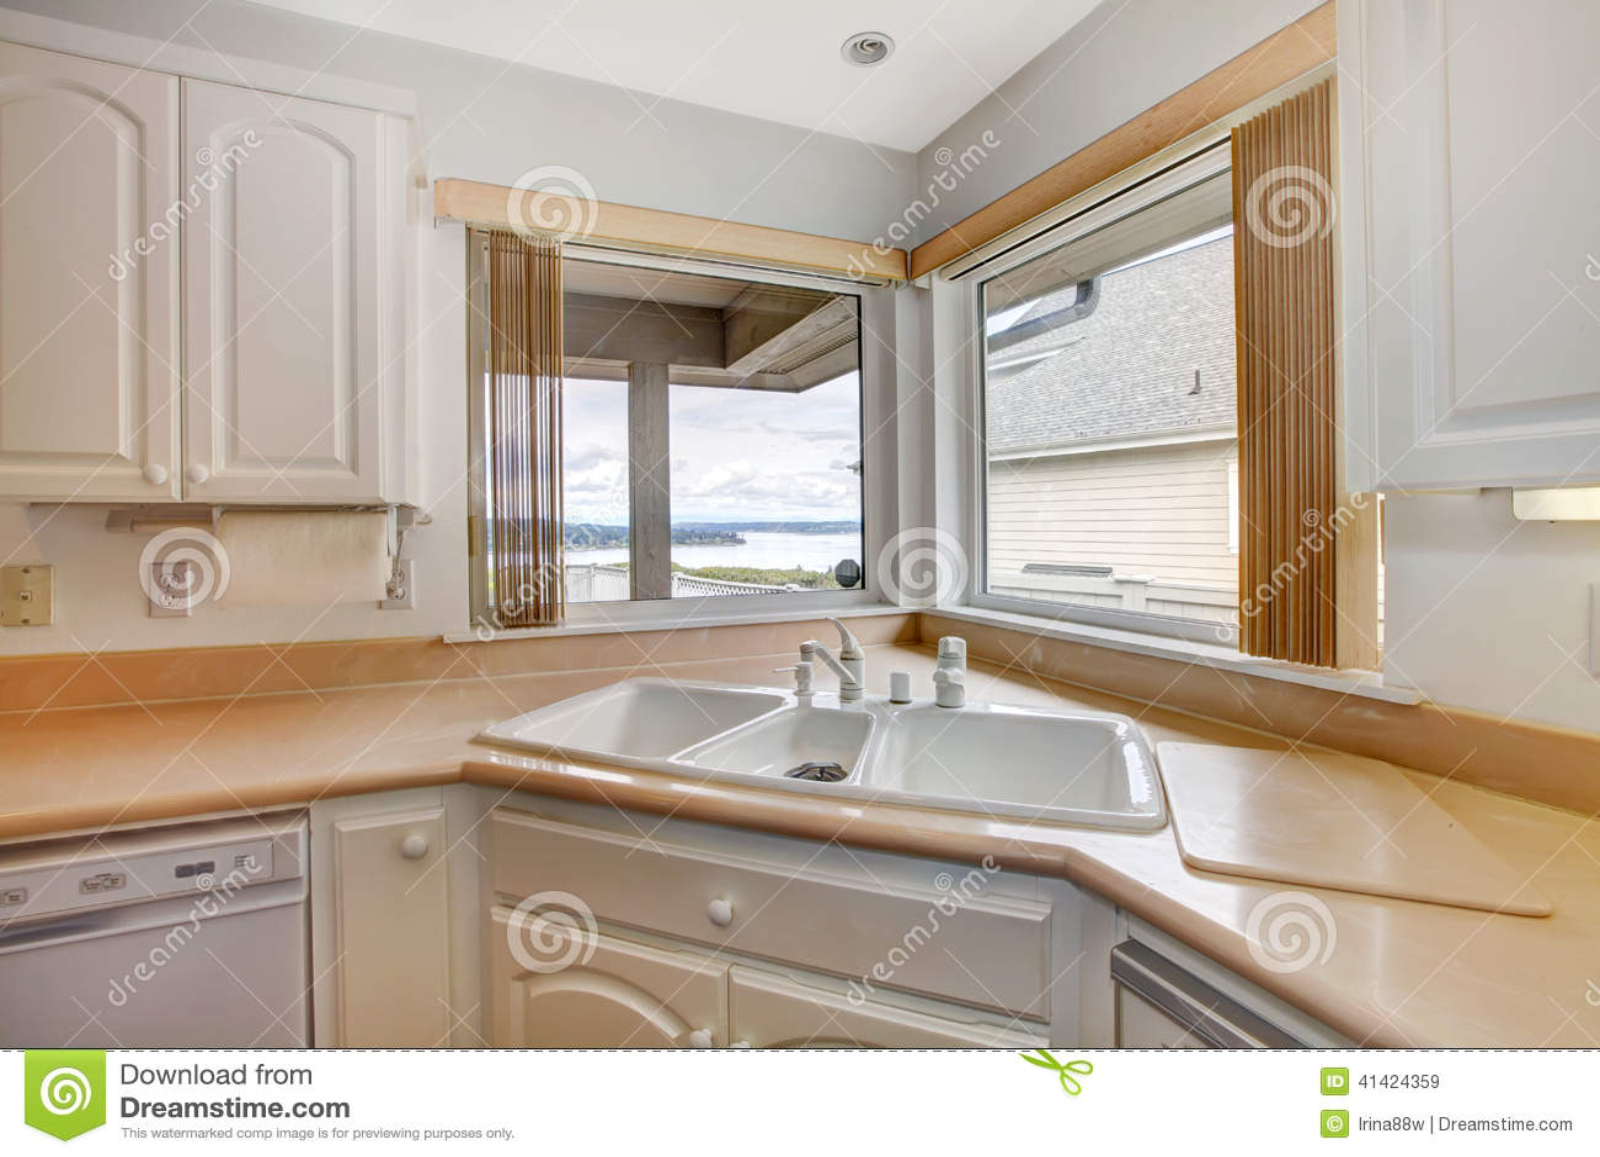 kitchen corner sinks laminate flooring 厨房看法的角落关闭 库存图片. 图片 包括有 墙壁, 室内, 庄园, 实际, 大使, 机柜, 房子, 空白 ...